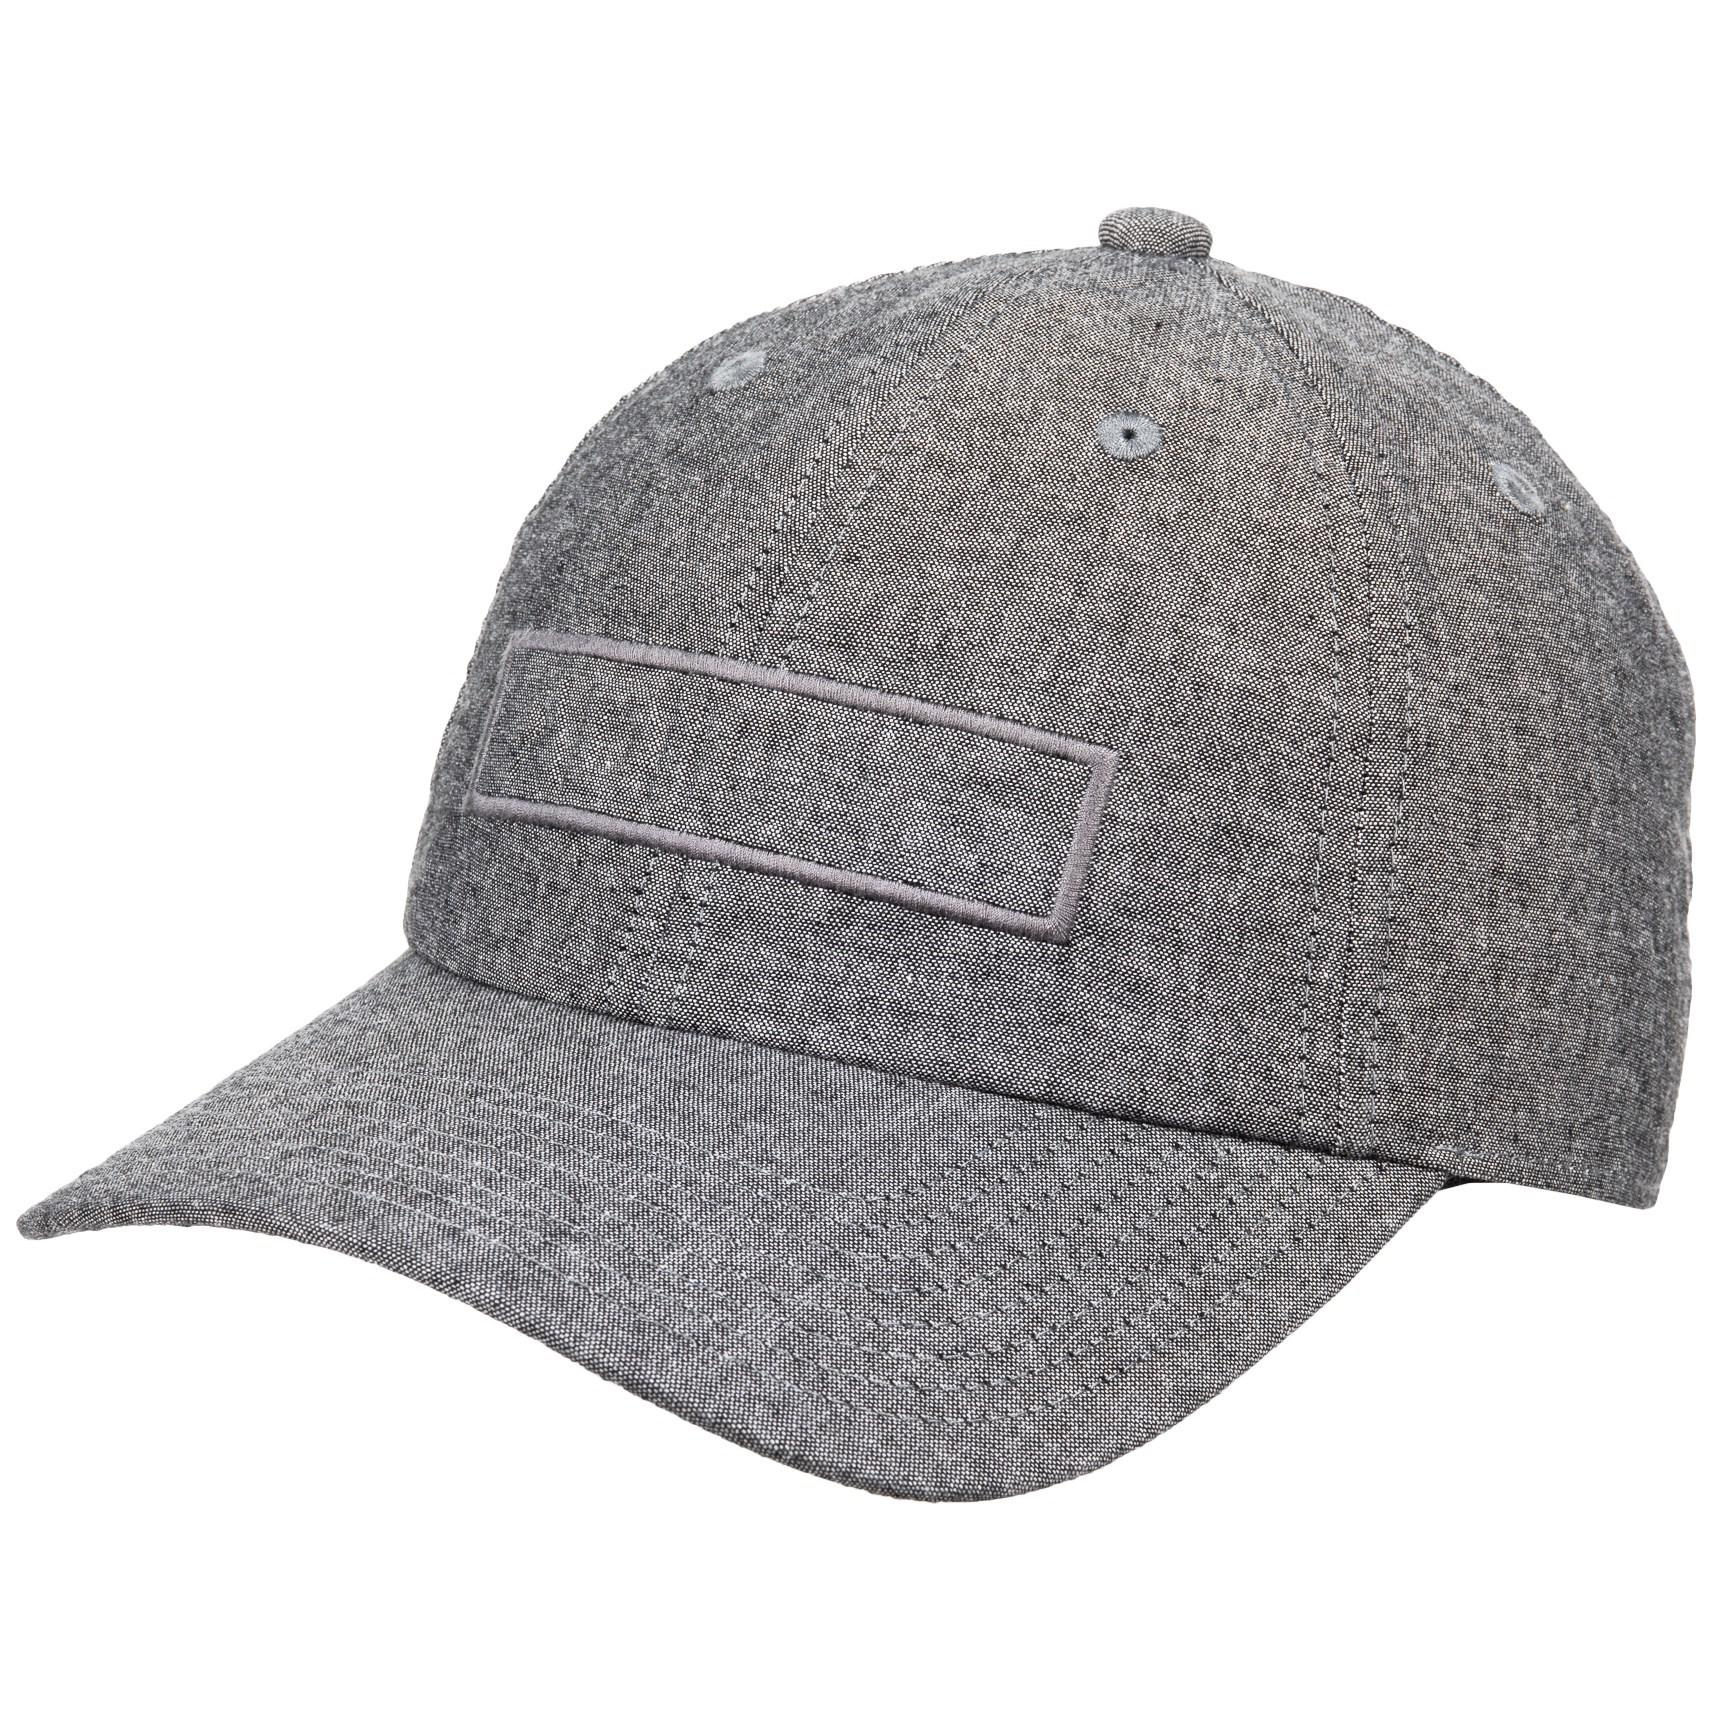 aaebf20ab17 Lyst - adidas Ultimate Plus Baseball Cap (for Men) in Gray for Men